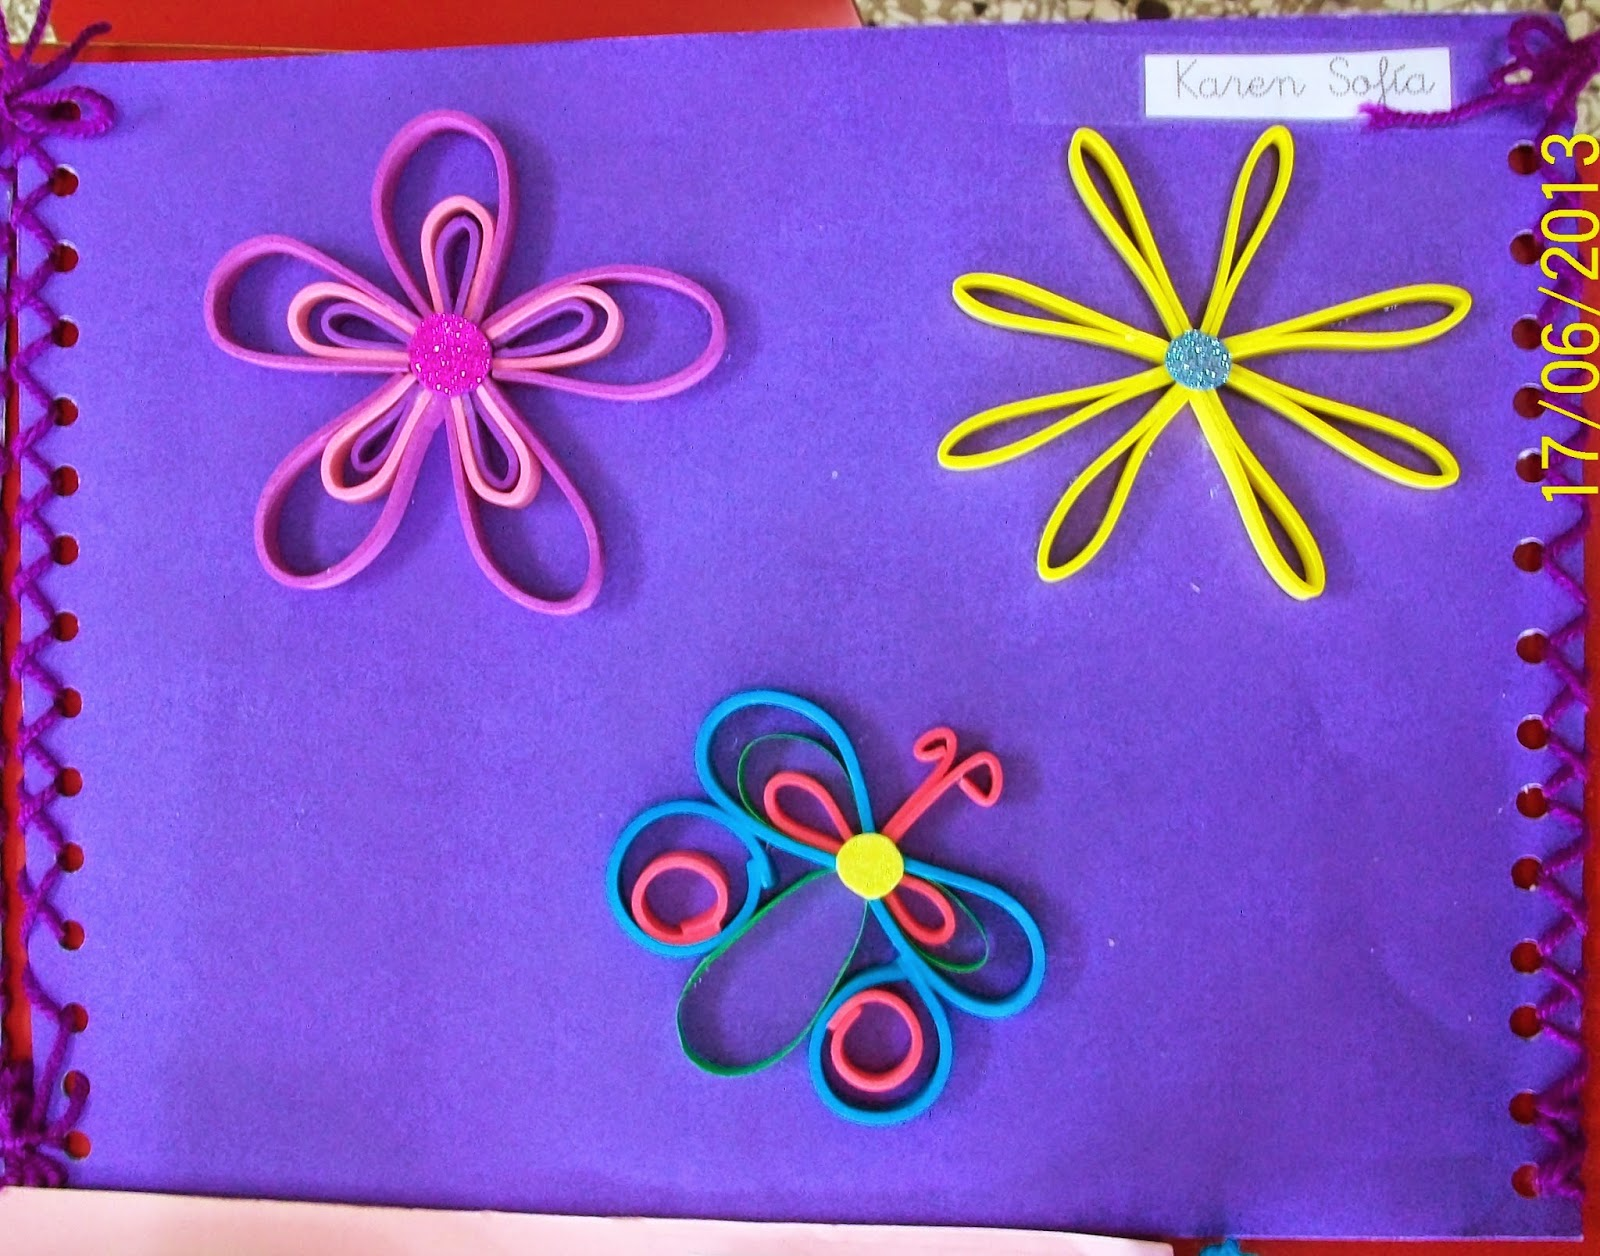 : Carpetas escolares decoradas ~ Guía de Educación Infantil